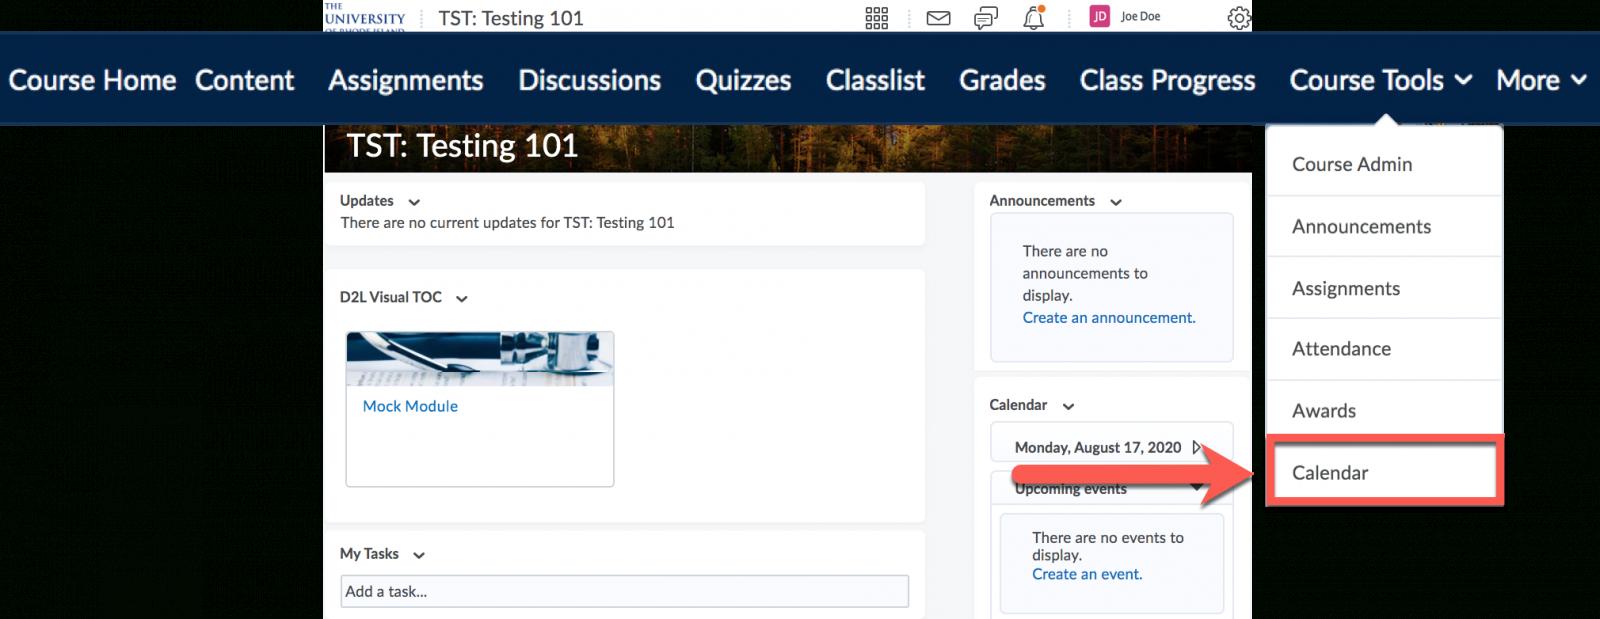 Using The Calendar – University Of Rhode Island :: Its Wiki With Regard To University Of Rhode Island Calendar 2021 2020